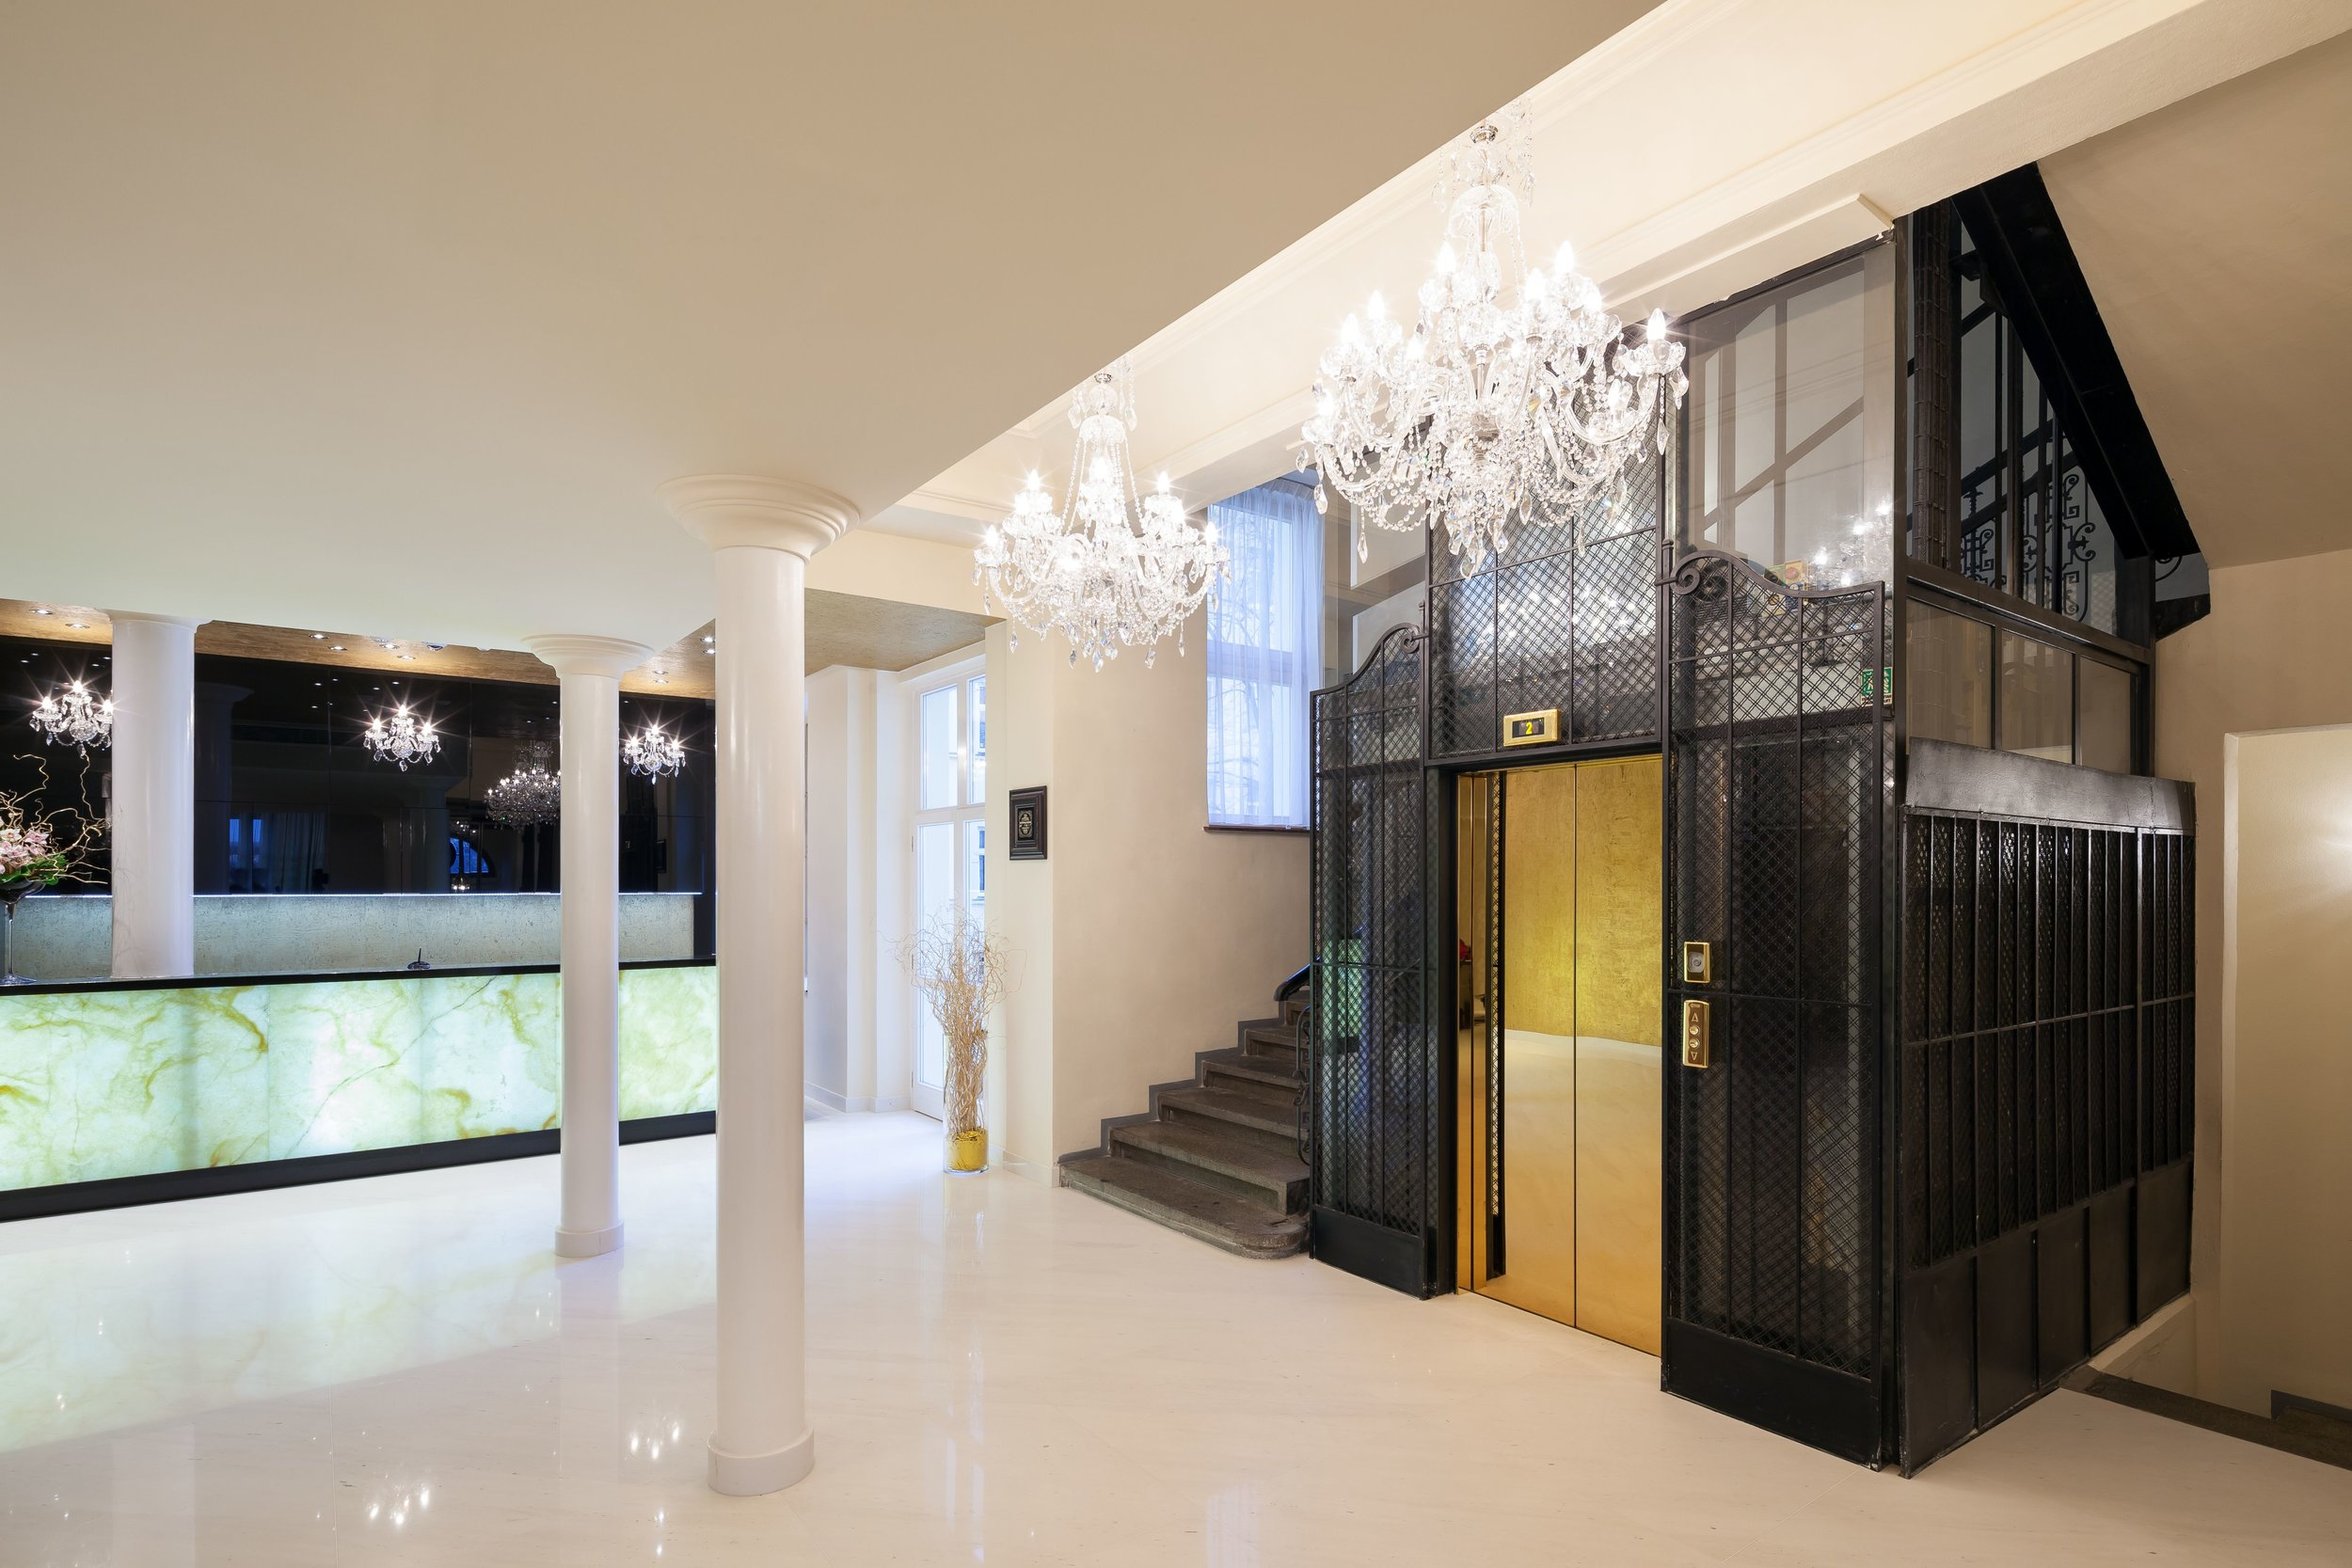 Hotel-King-David-Wranovsky-Crystal-Chandelier-4.jpg